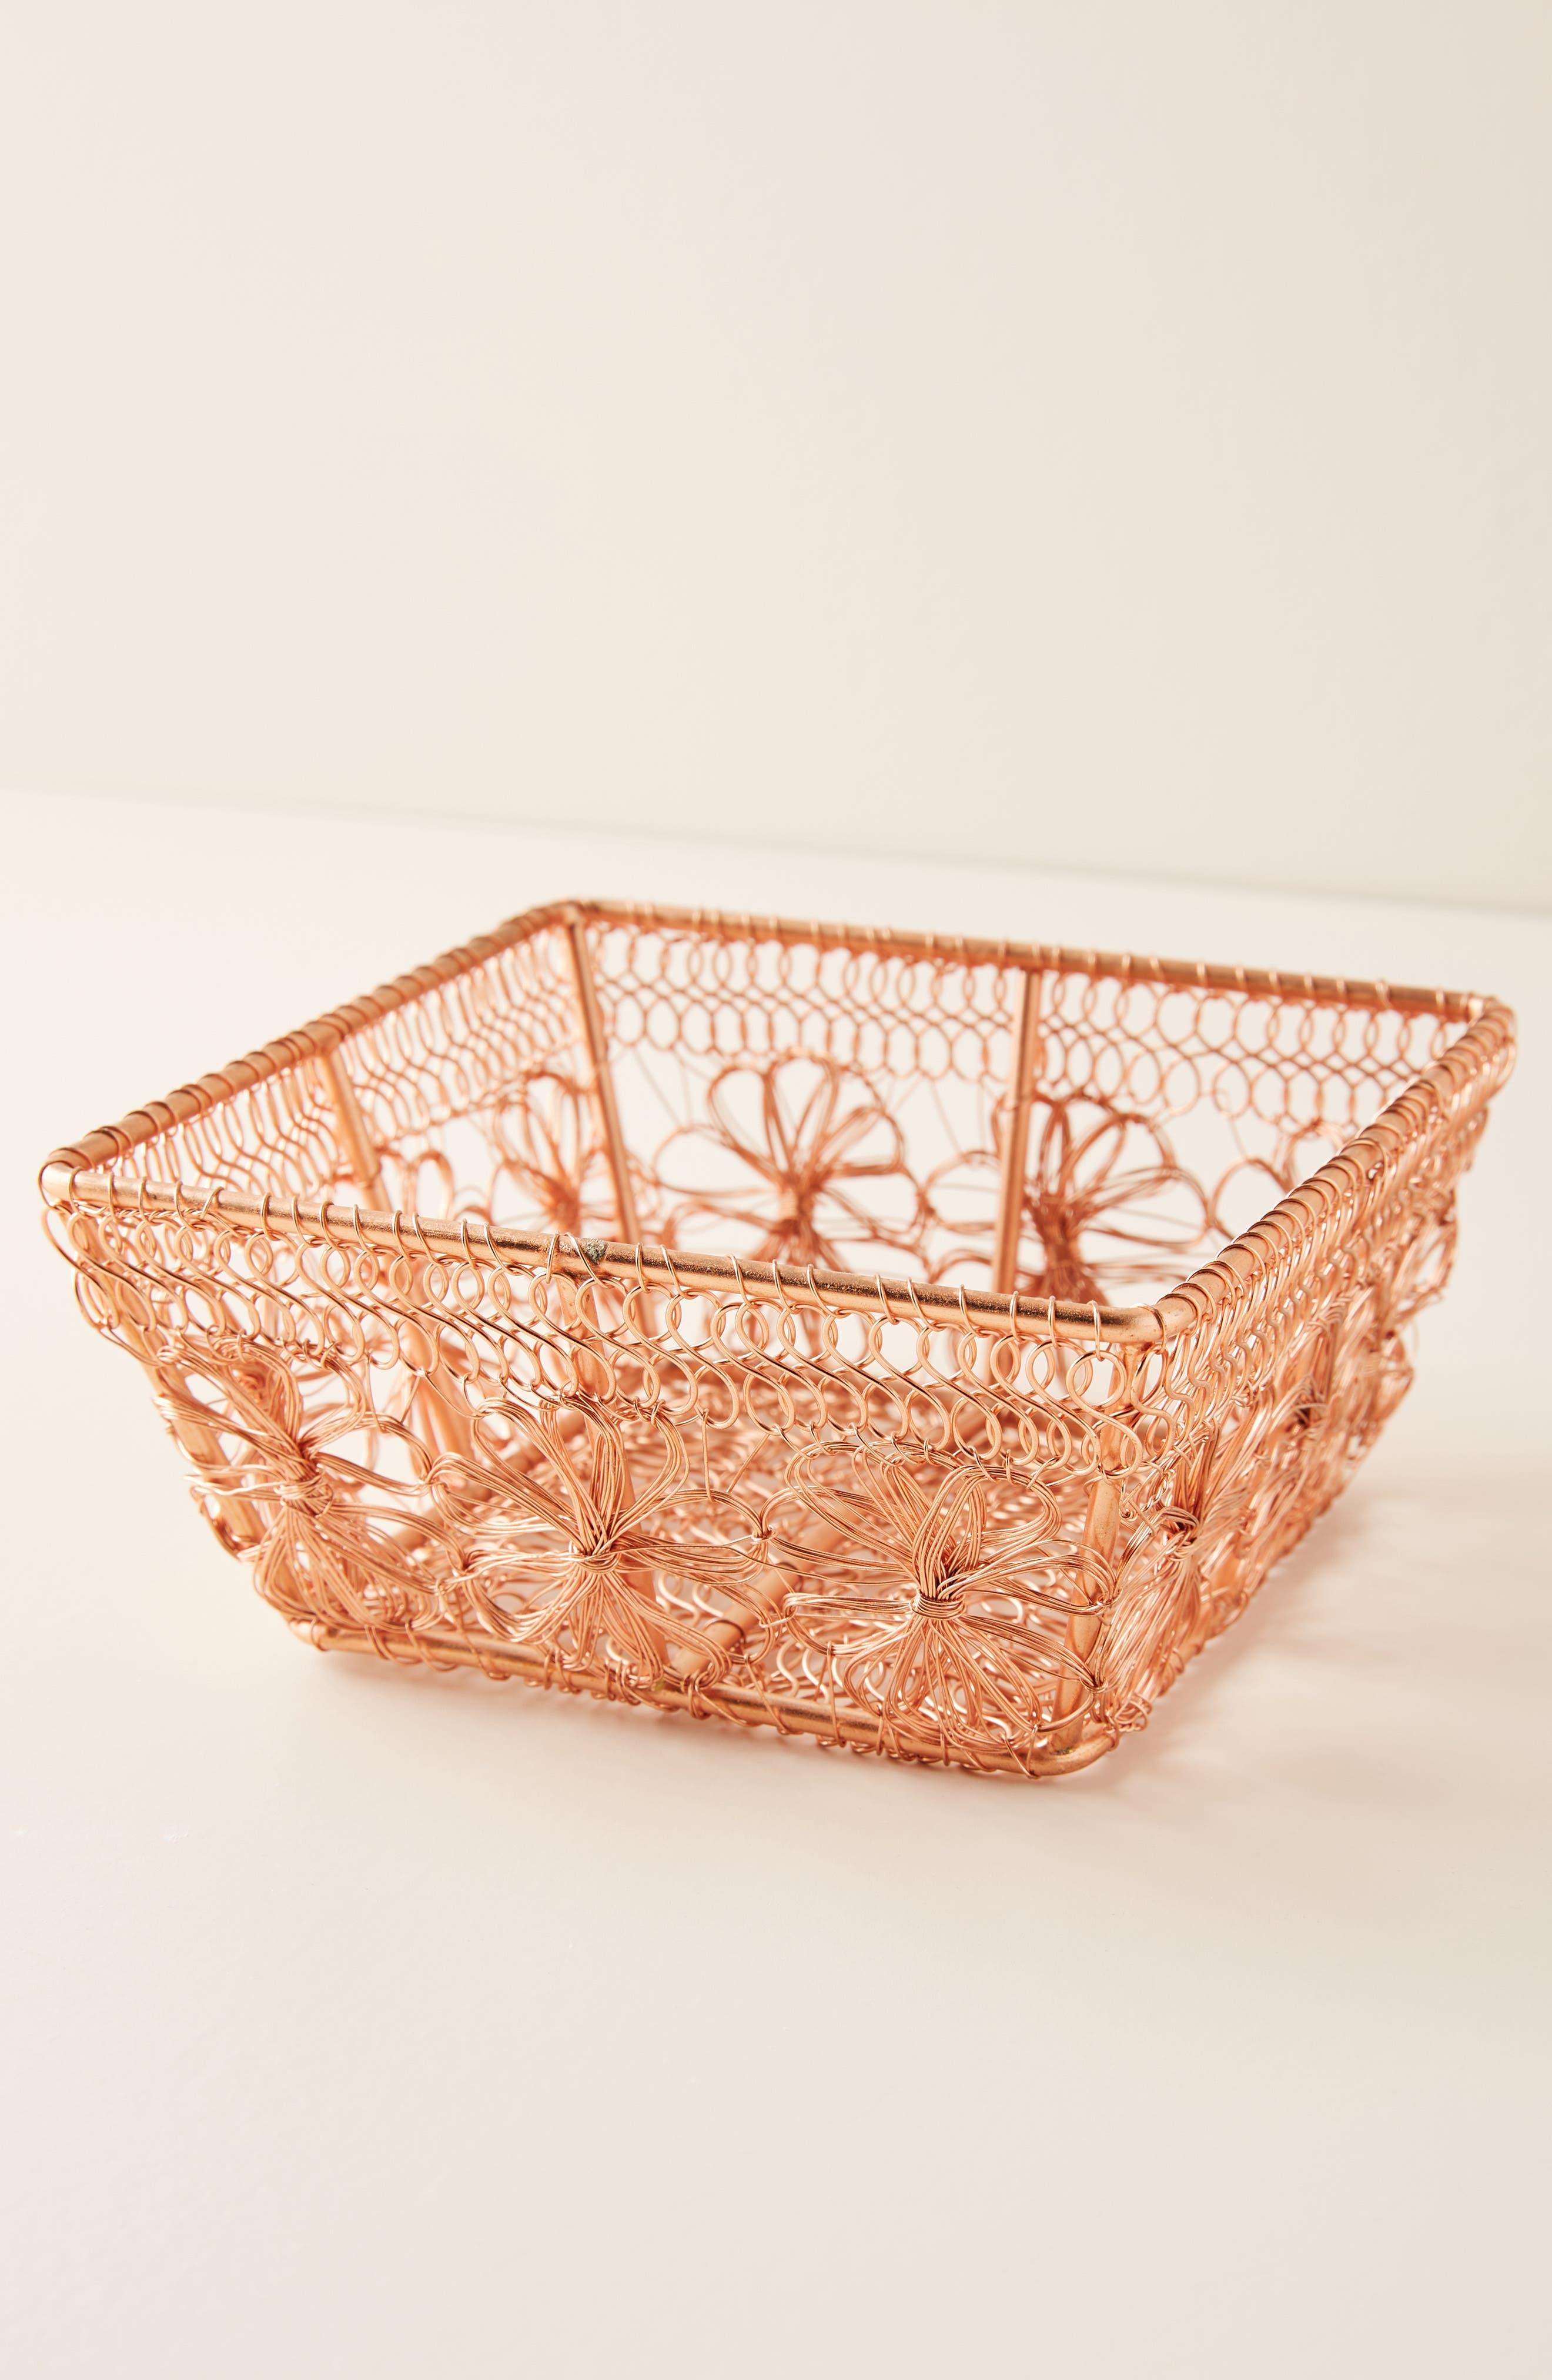 ANTHROPOLOGIE, Copper Floral Berry Basket, Main thumbnail 1, color, COPPER